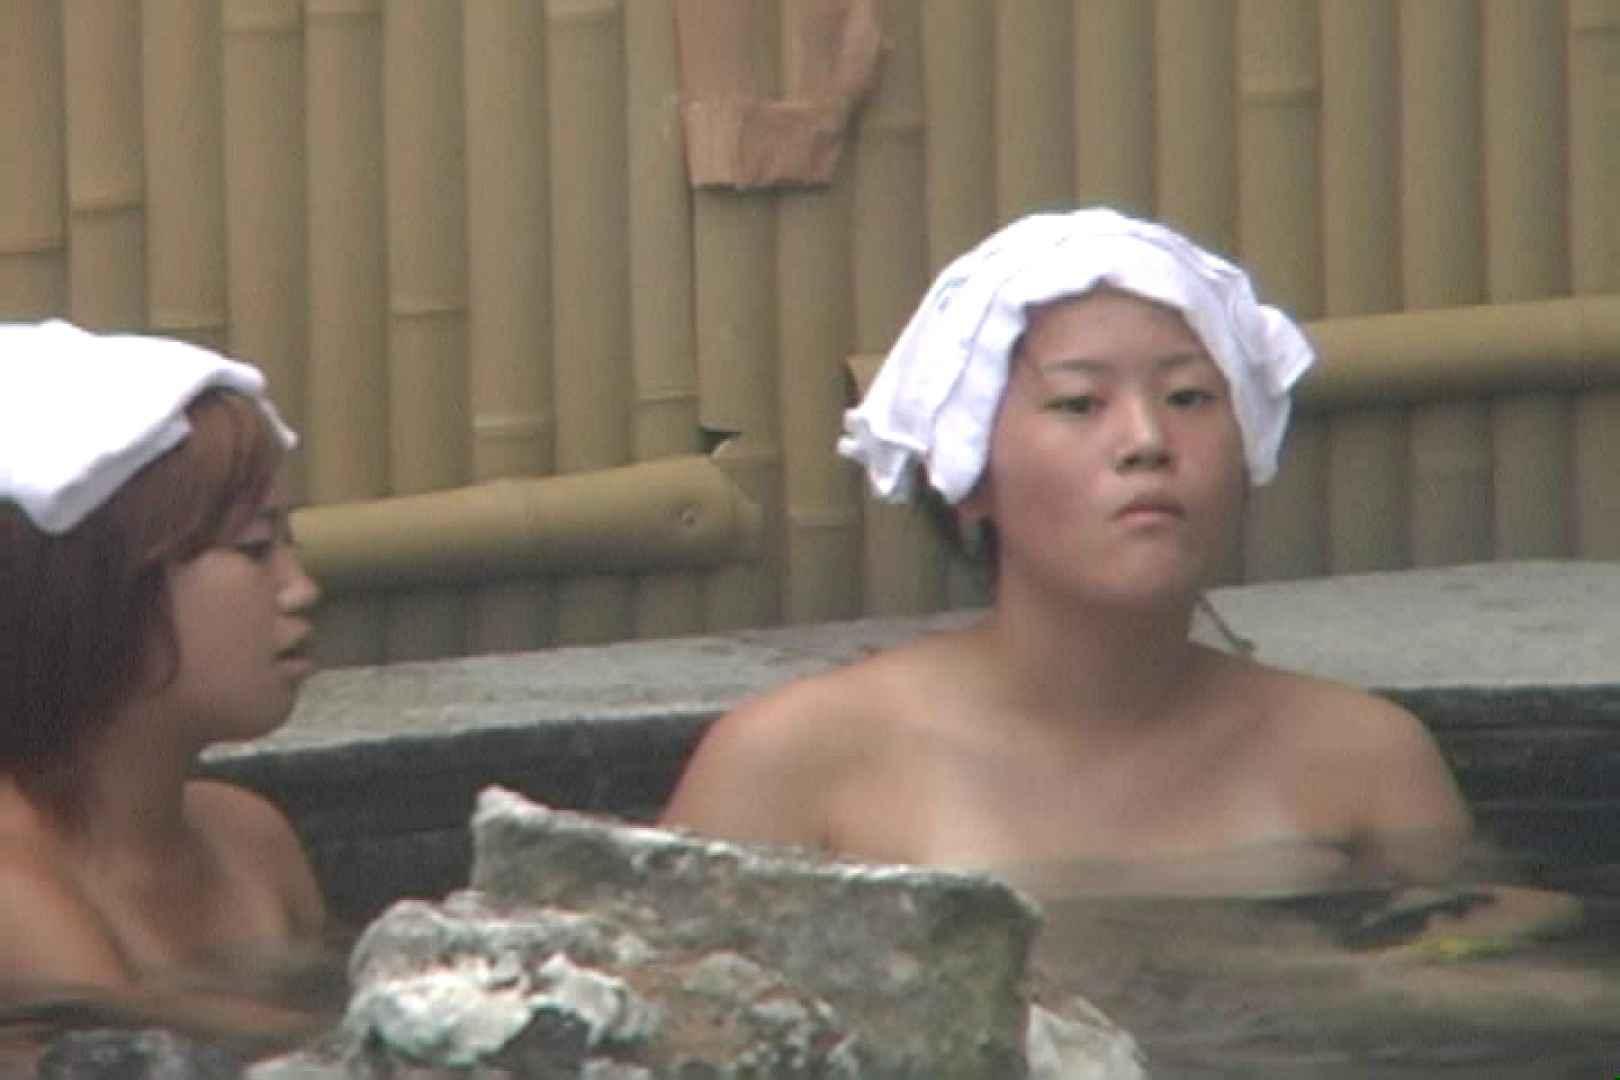 Aquaな露天風呂Vol.42【VIP限定】 盗撮シリーズ | 露天風呂編  82PIX 49